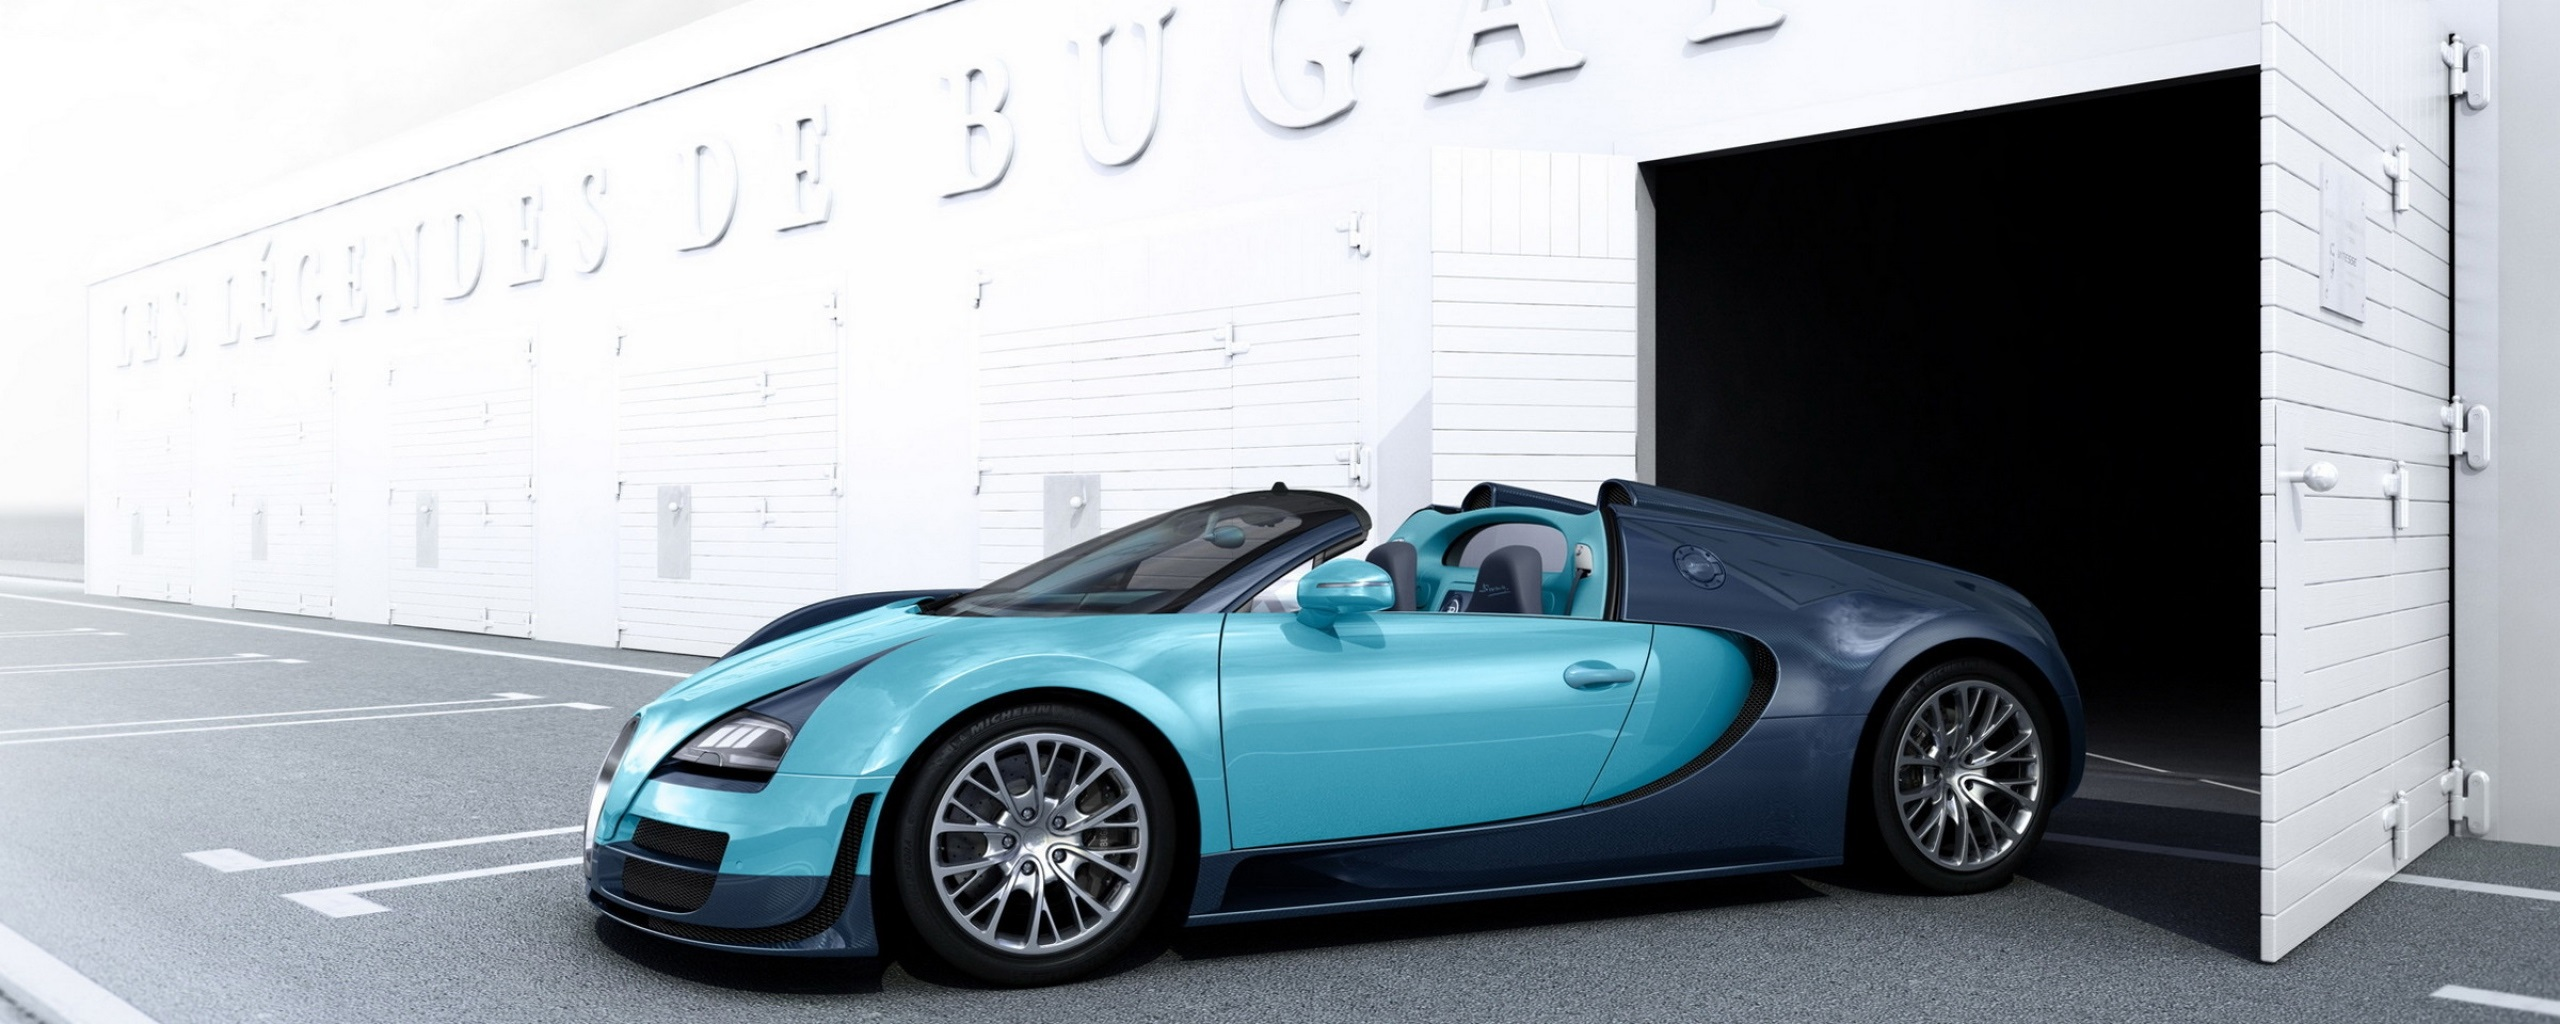 Super Cars Wallpapers Free Download Bugatti Veyron Grand Sport Vitesse Wallpaper In Different